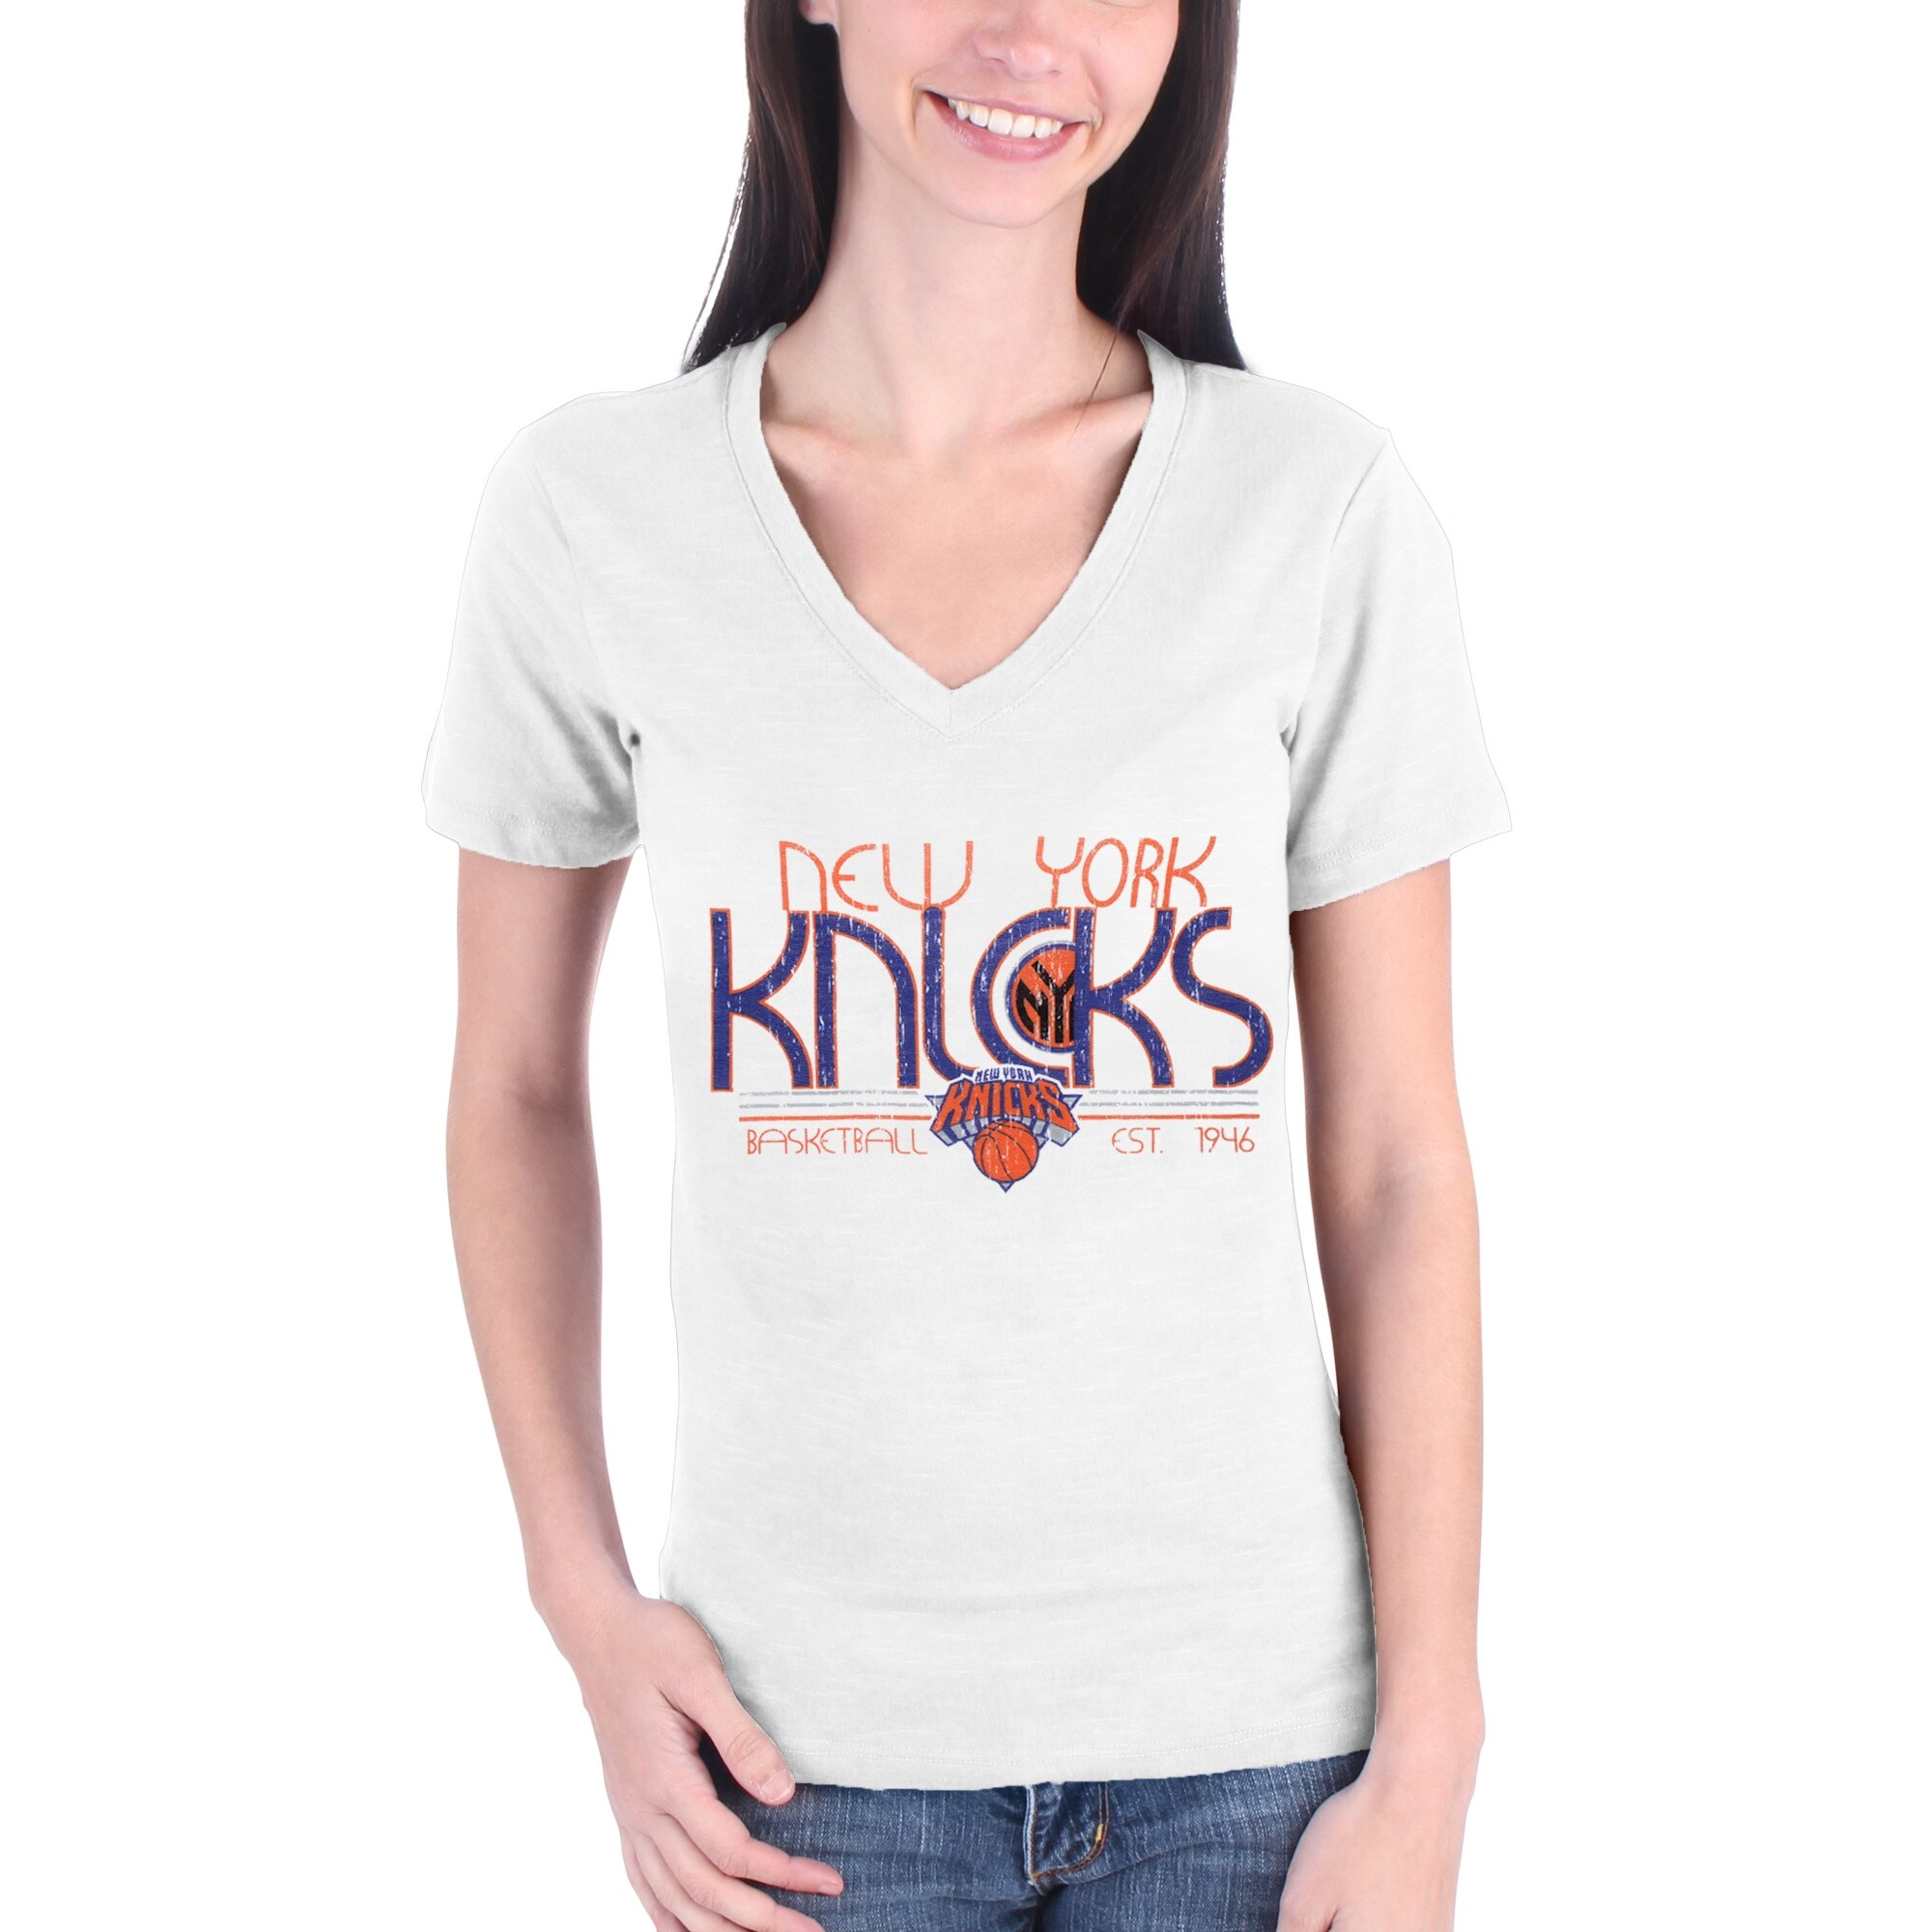 New York Knicks Women's Lifestyle Burnout Slim-Fit V-Neck T-Shirt - White